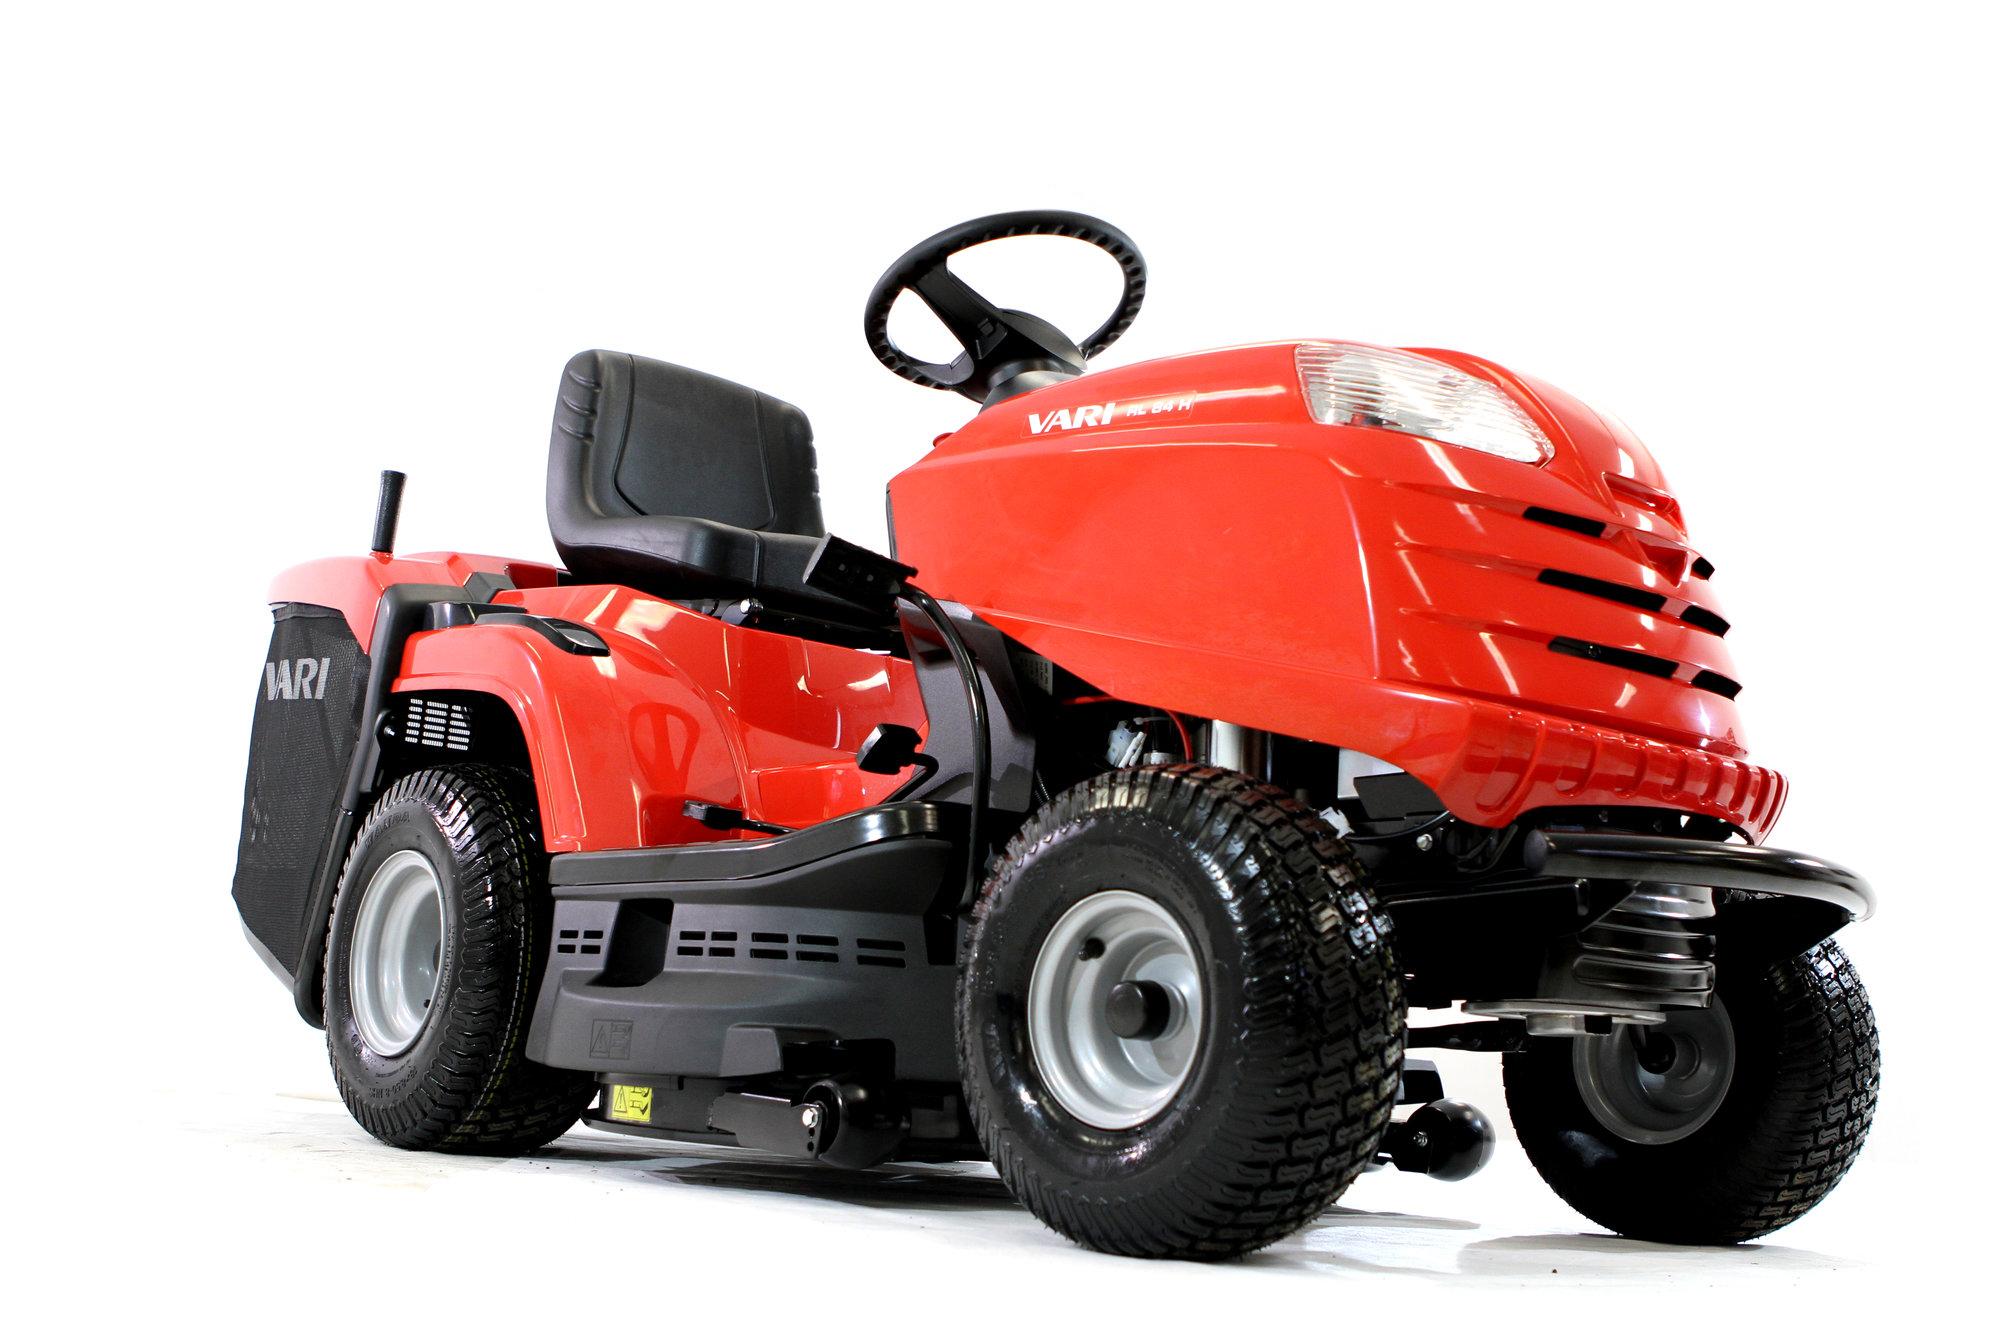 Travní traktor  VARI RL 98 H